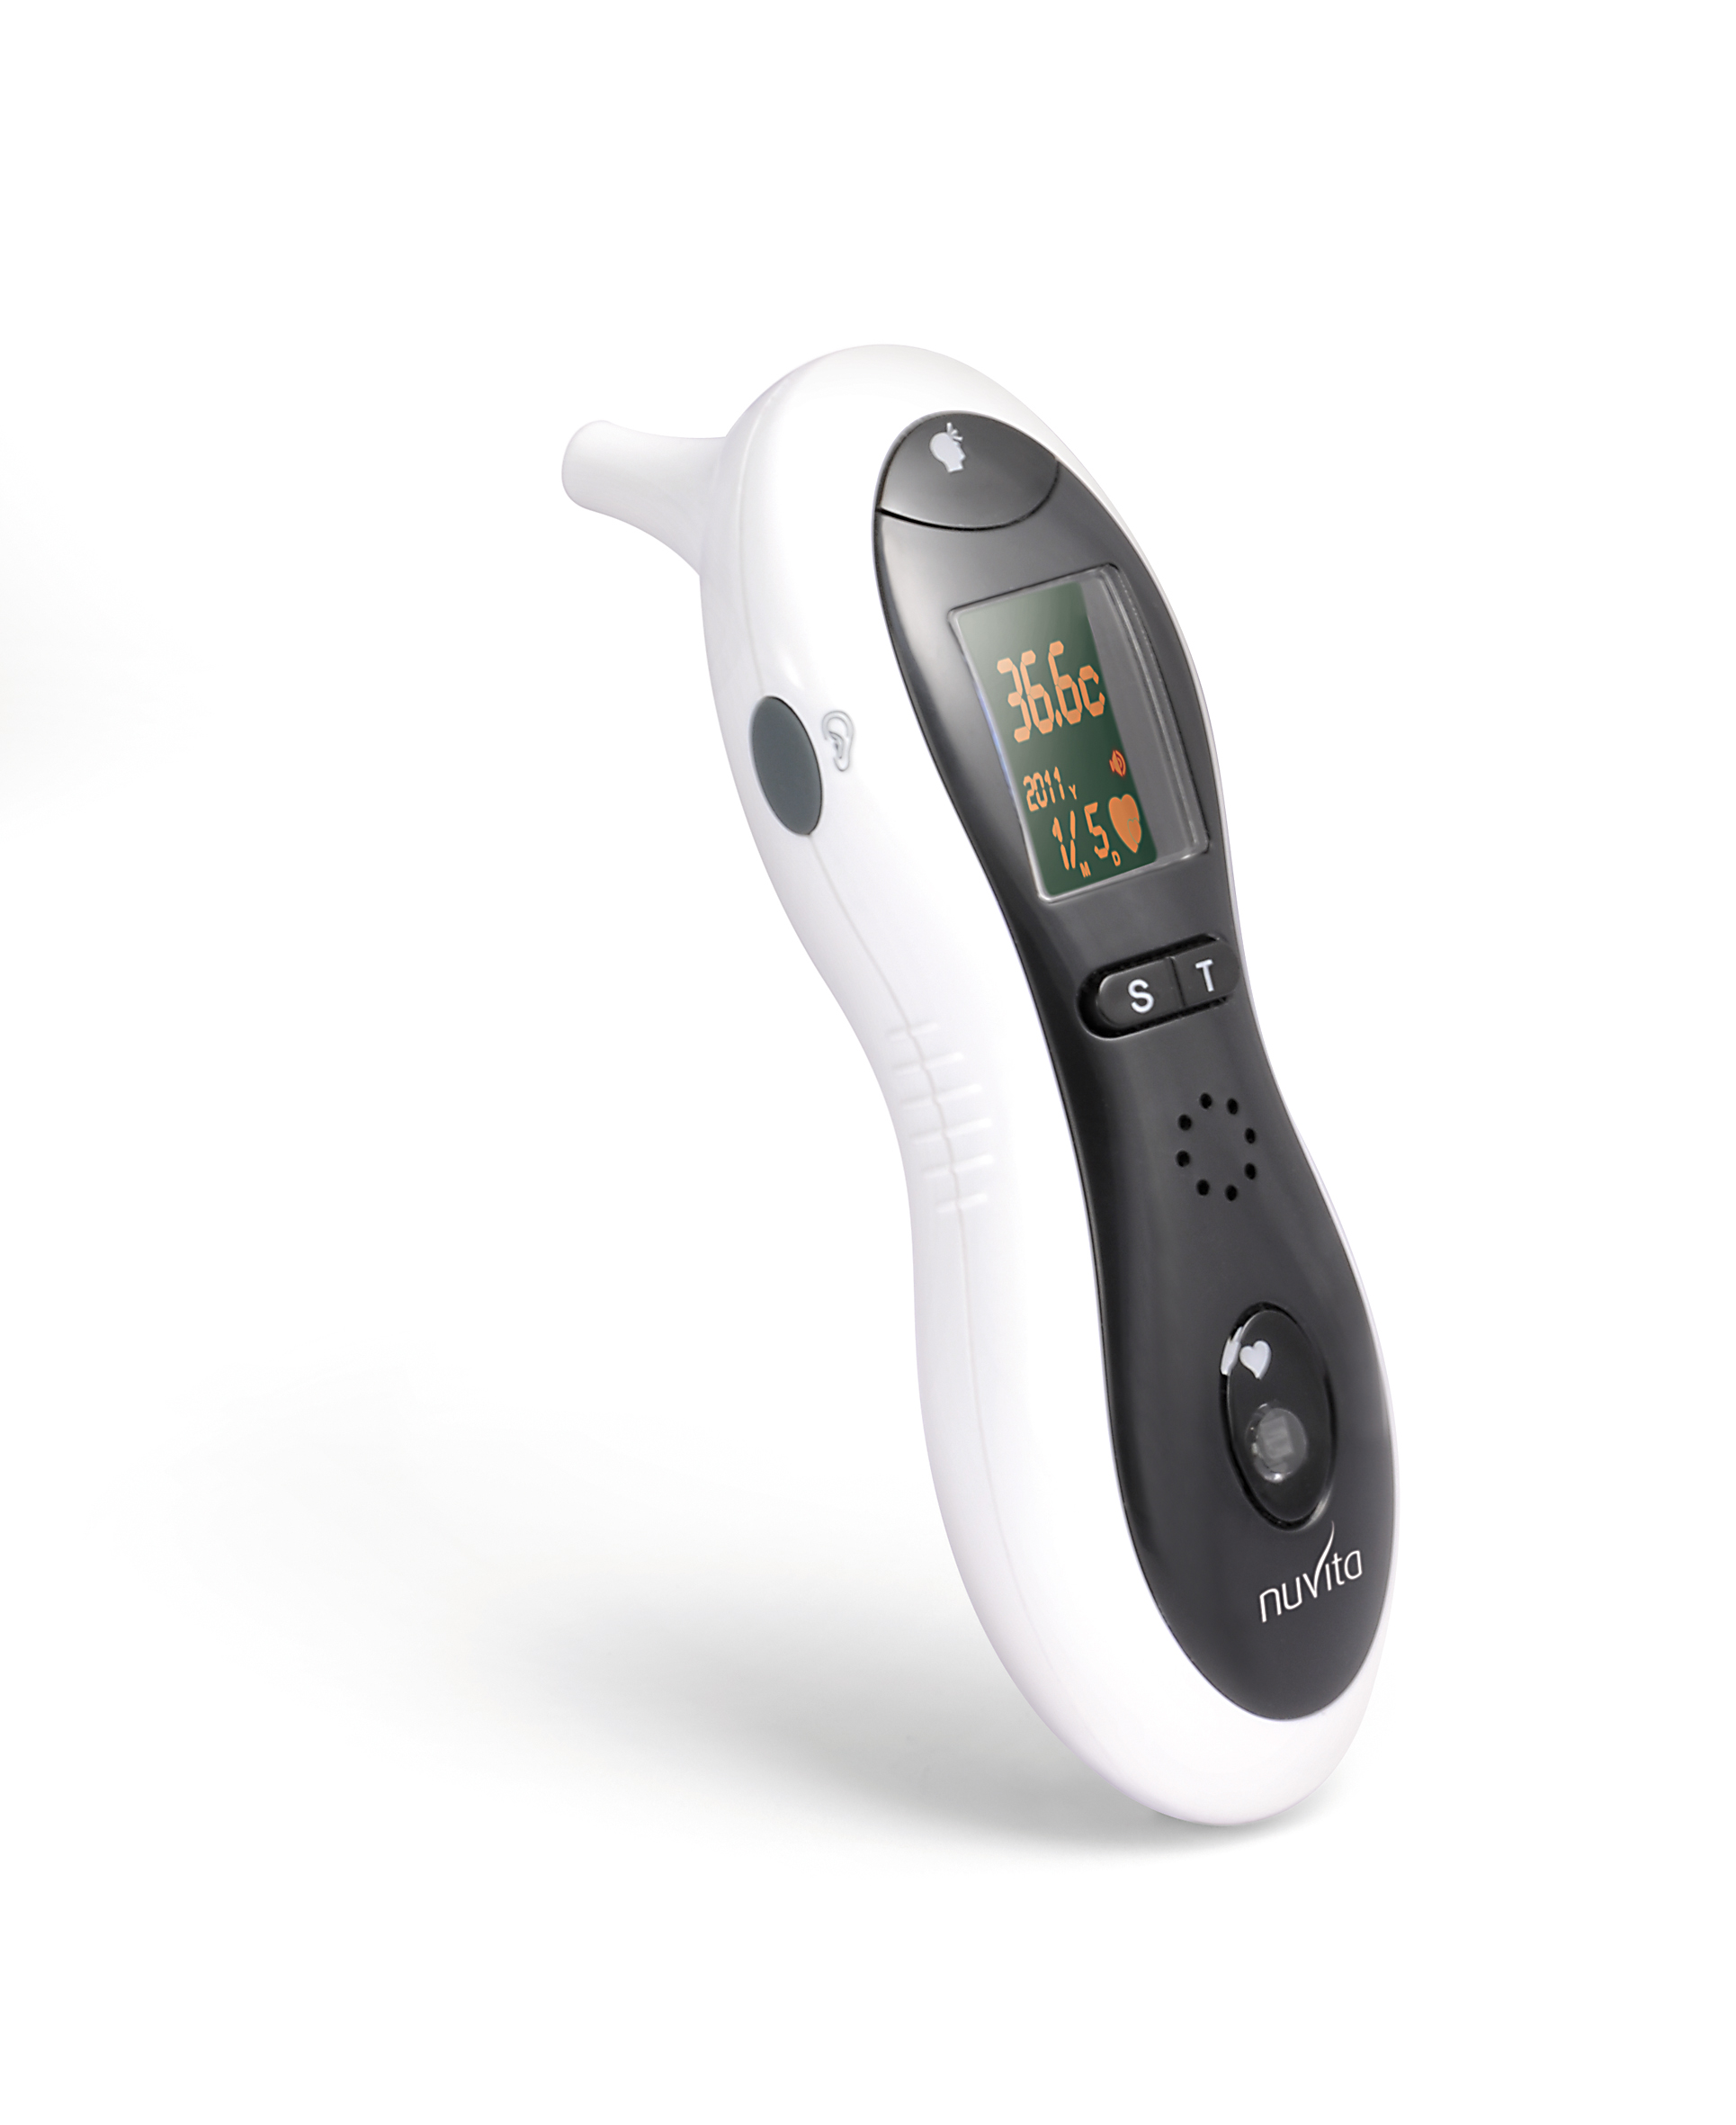 Nuvita - Termometru de ureche si frunte